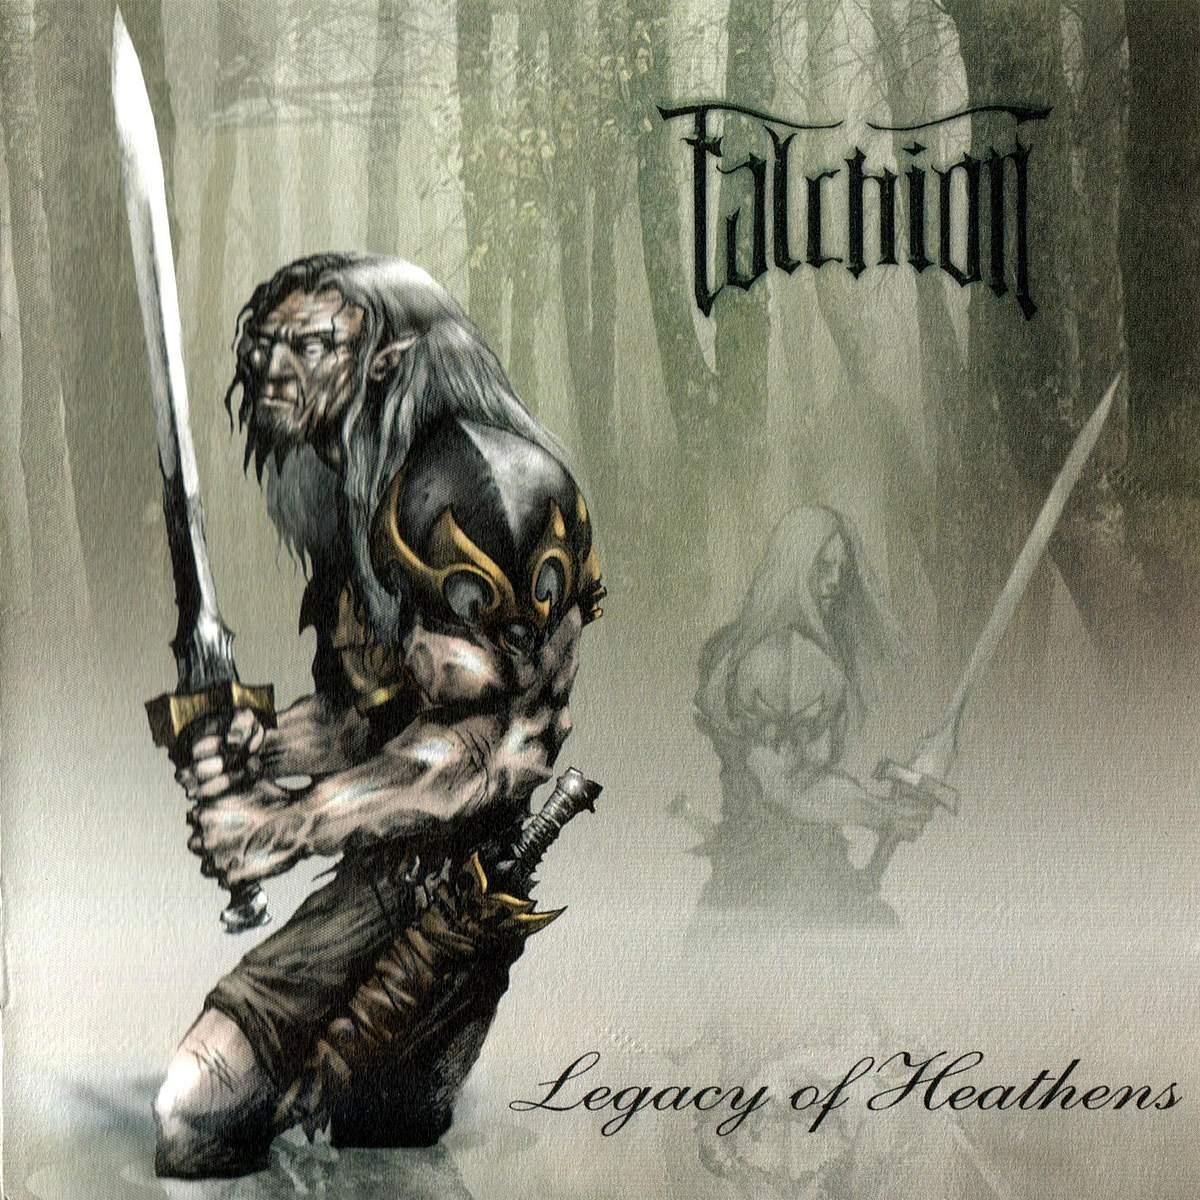 Falchion - Legacy of Heathens